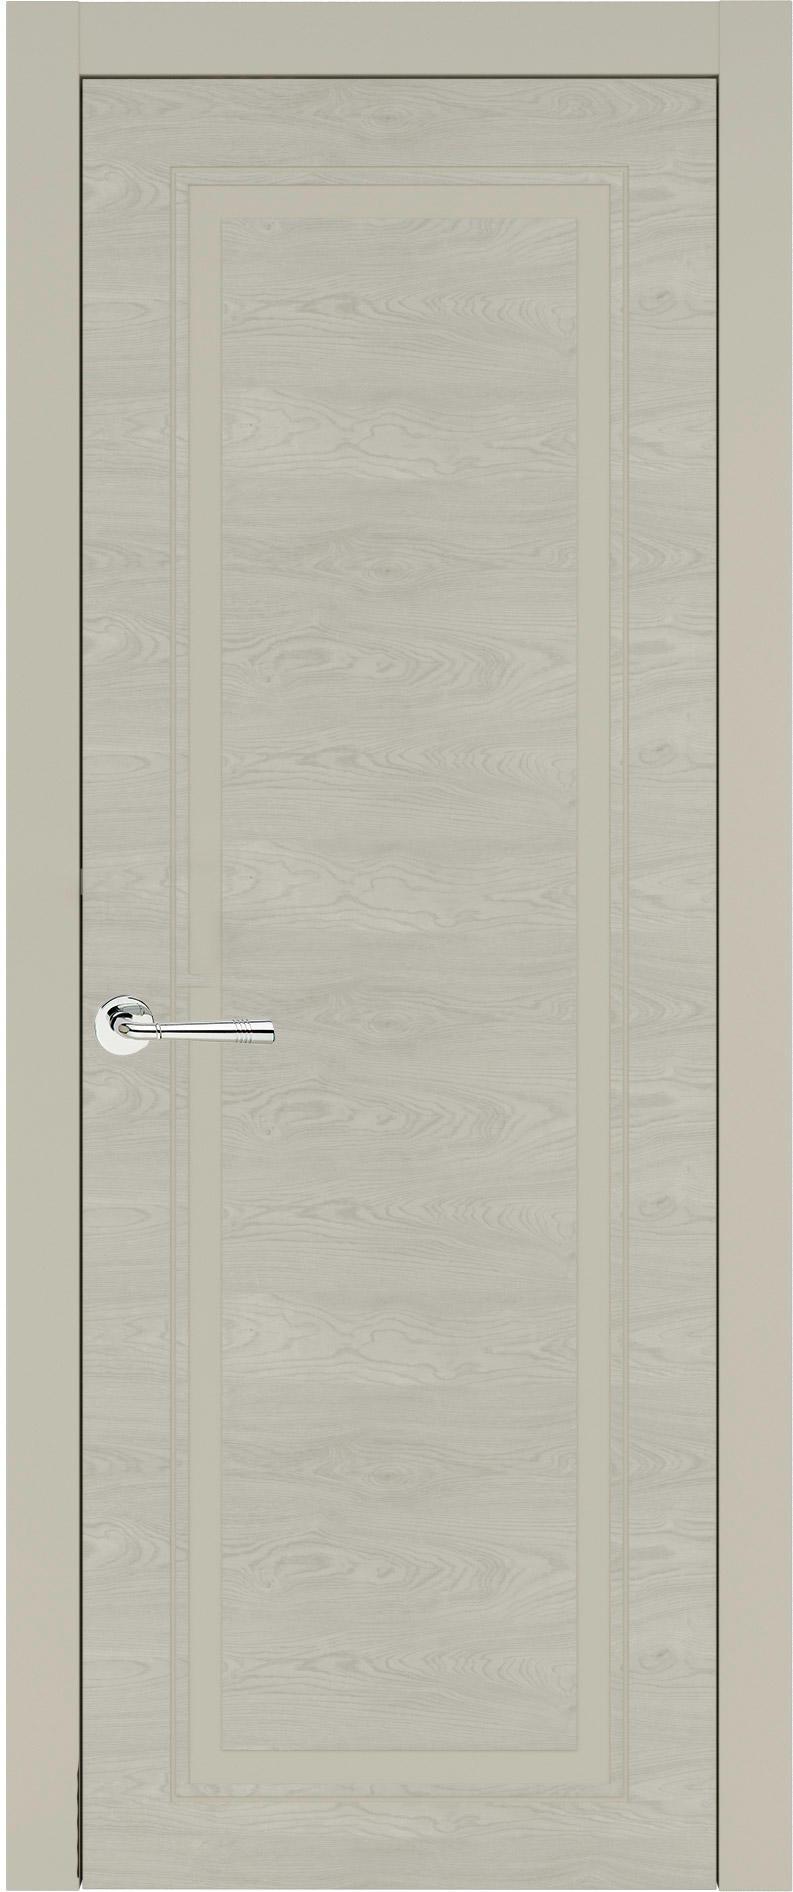 Domenica Neo Classic цвет - Серо-оливковая эмаль по шпону (RAL 7032) Без стекла (ДГ)